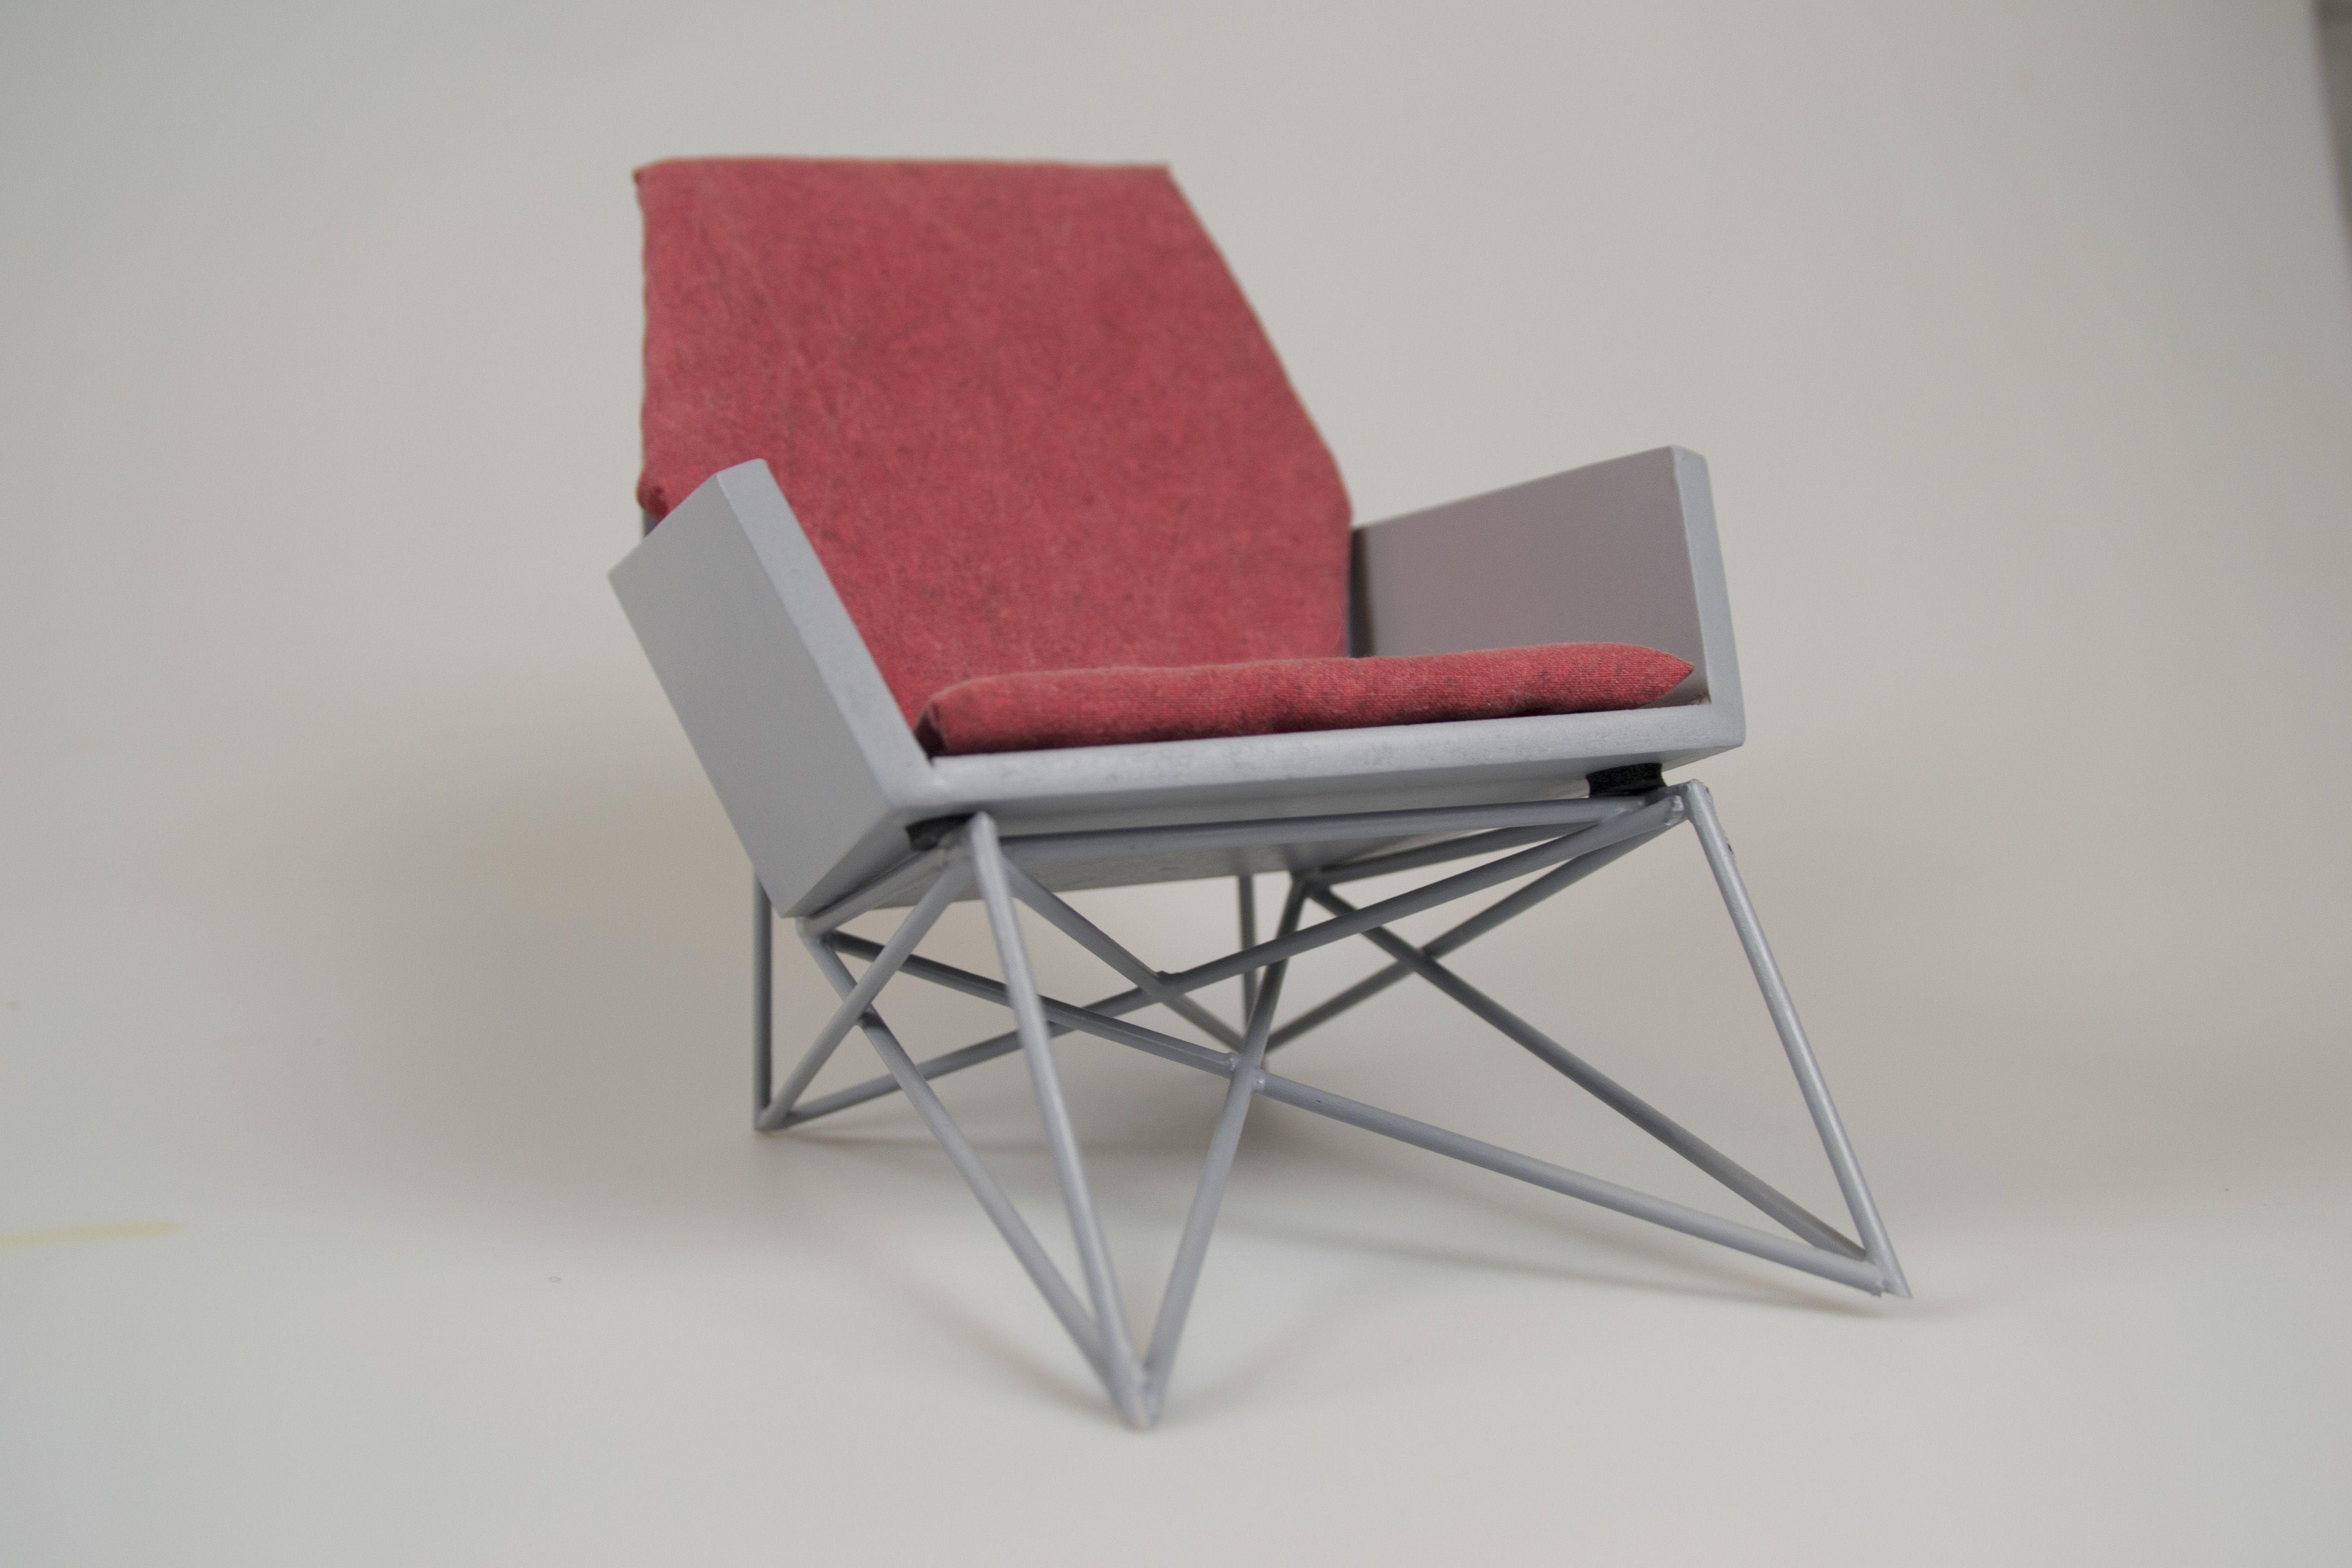 Hard goods chair scale model my work Pinterest